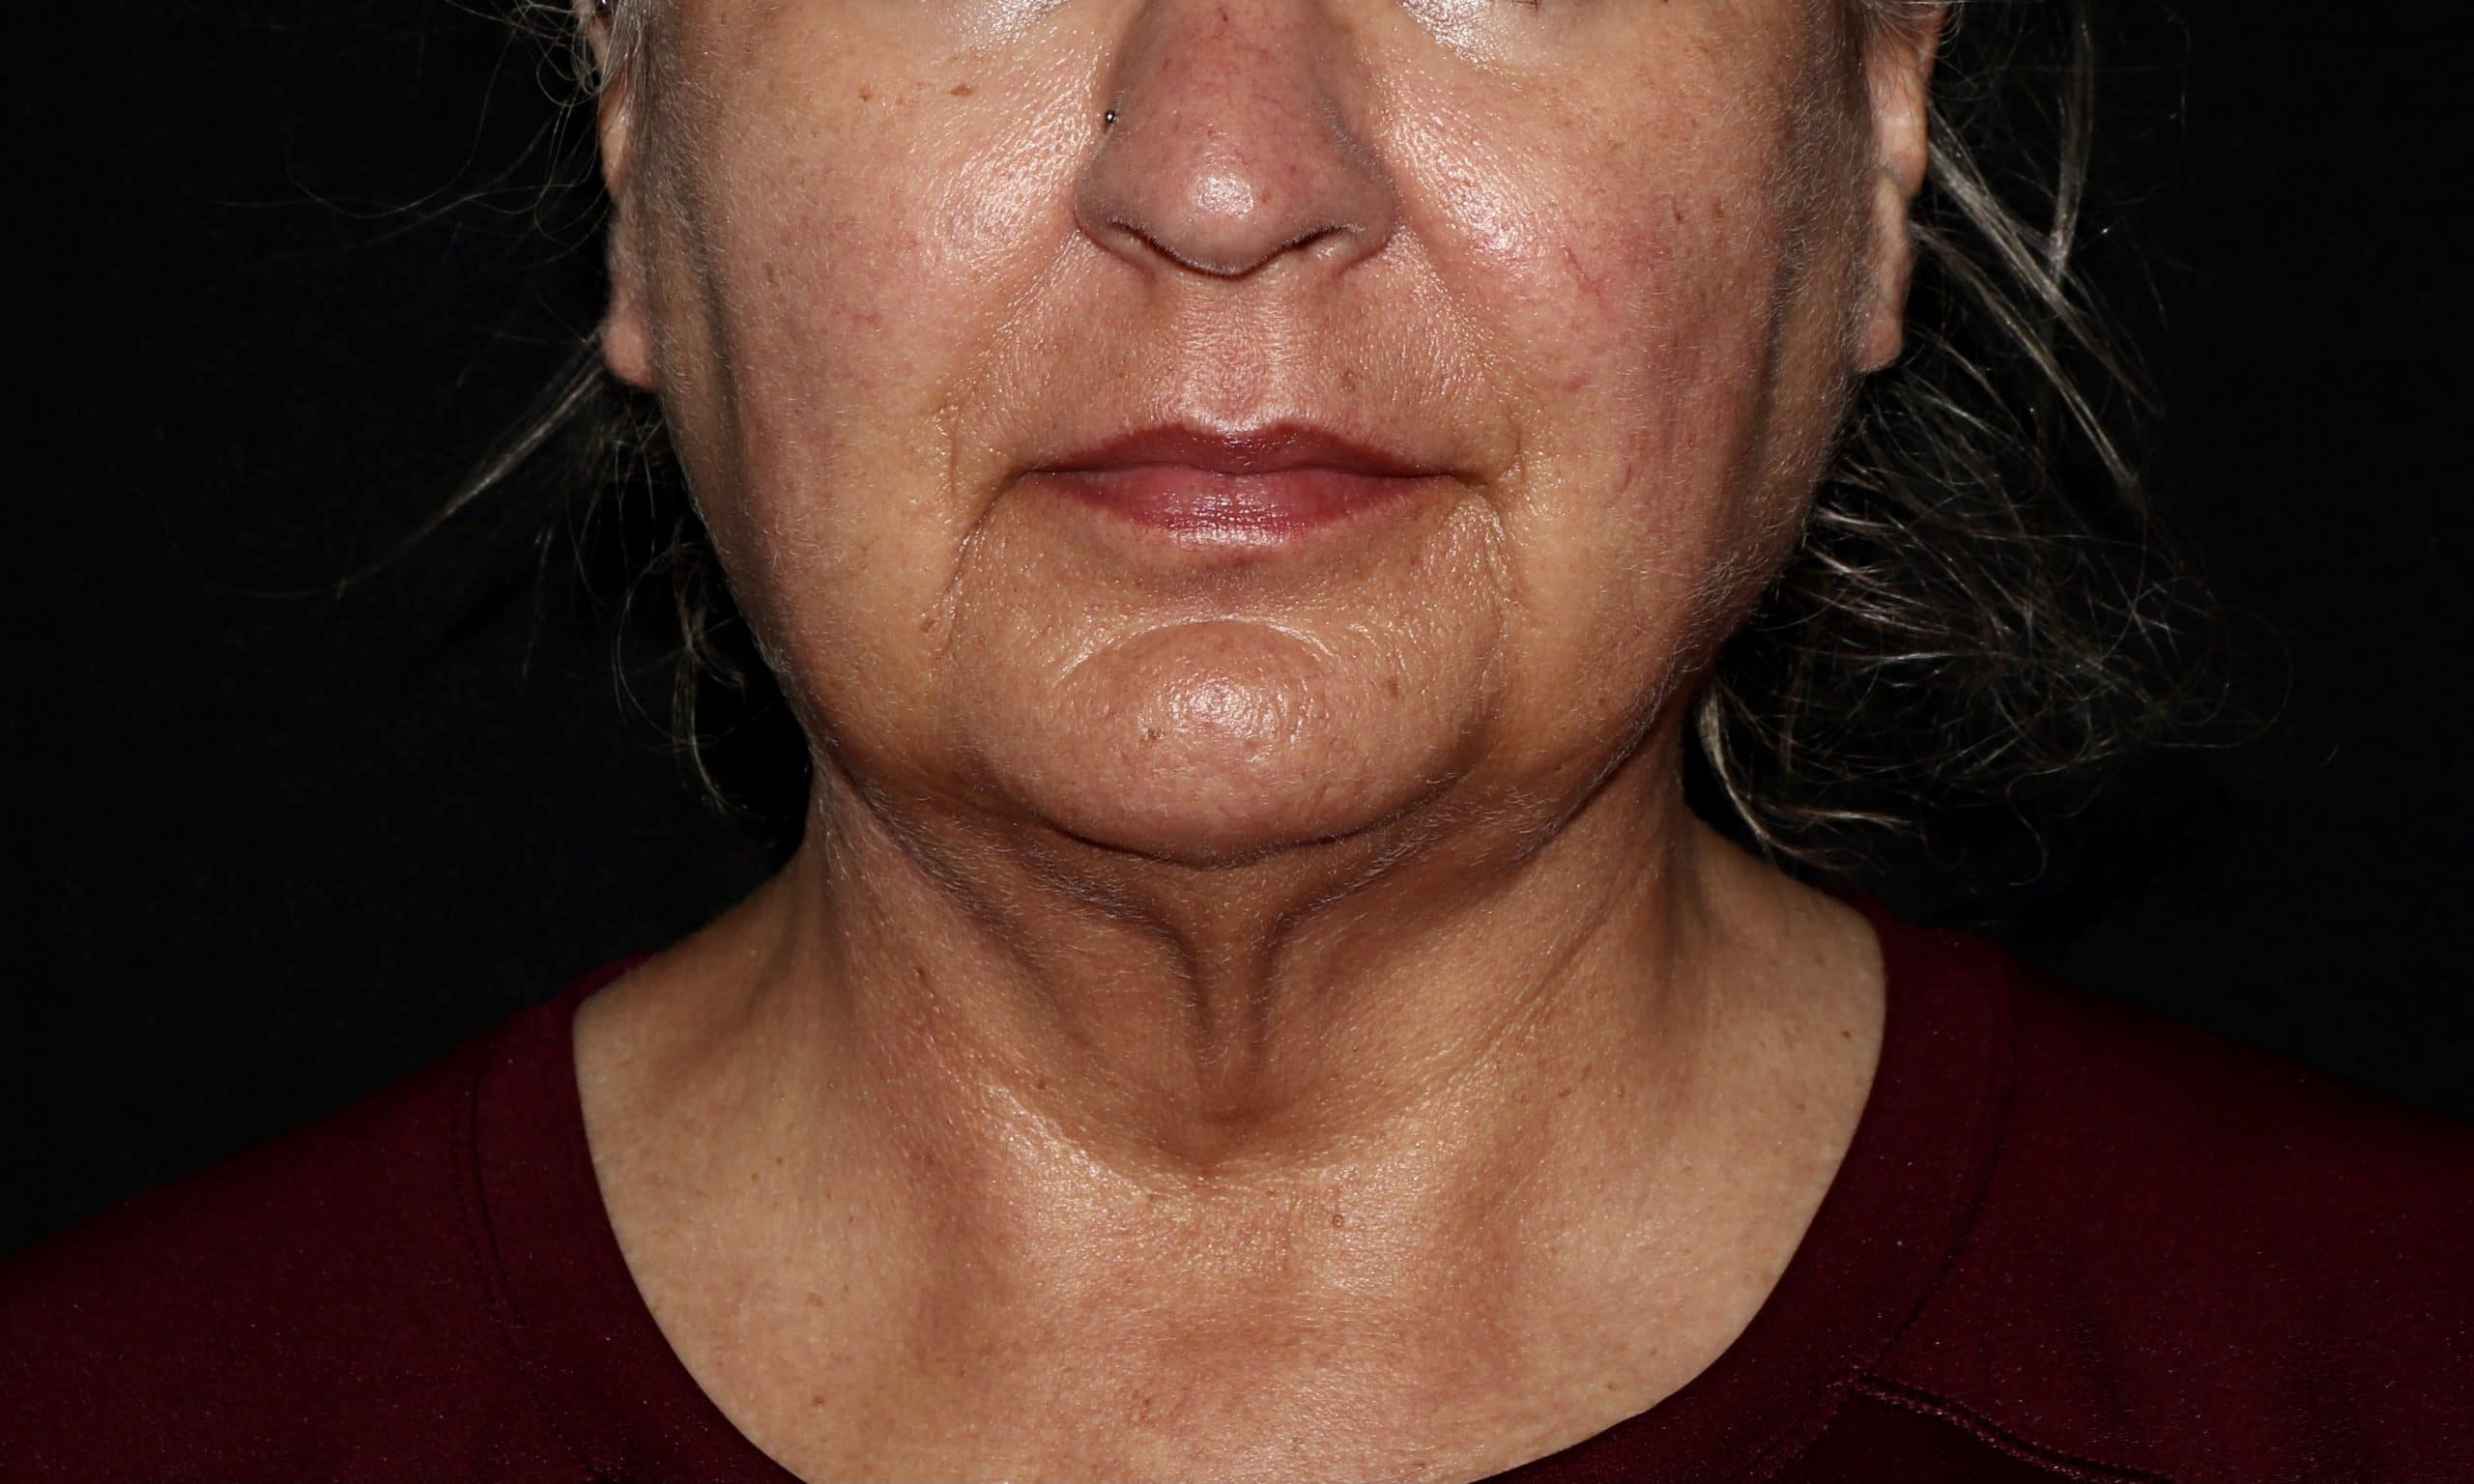 Coolsculpting Neck Treatment Results